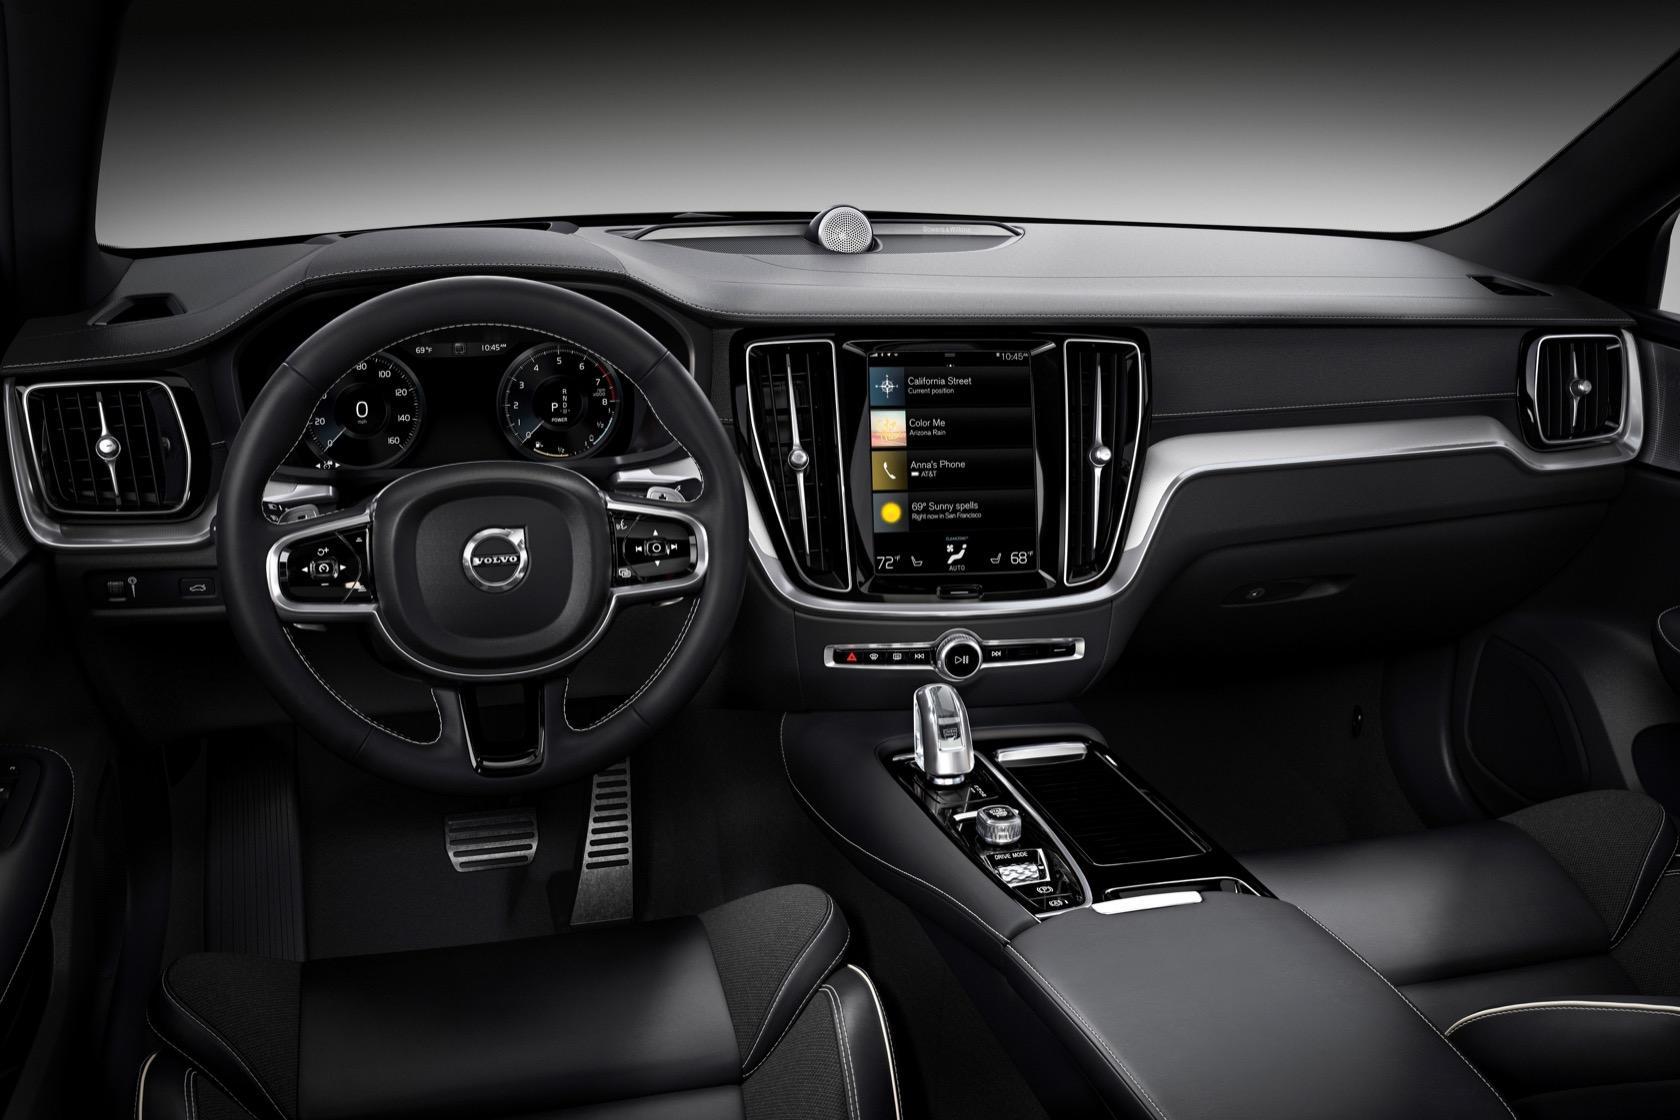 Volvo S60 Polestar >> The 2019 Volvo S60 Polestar Will Be Rarer Than A Supercar